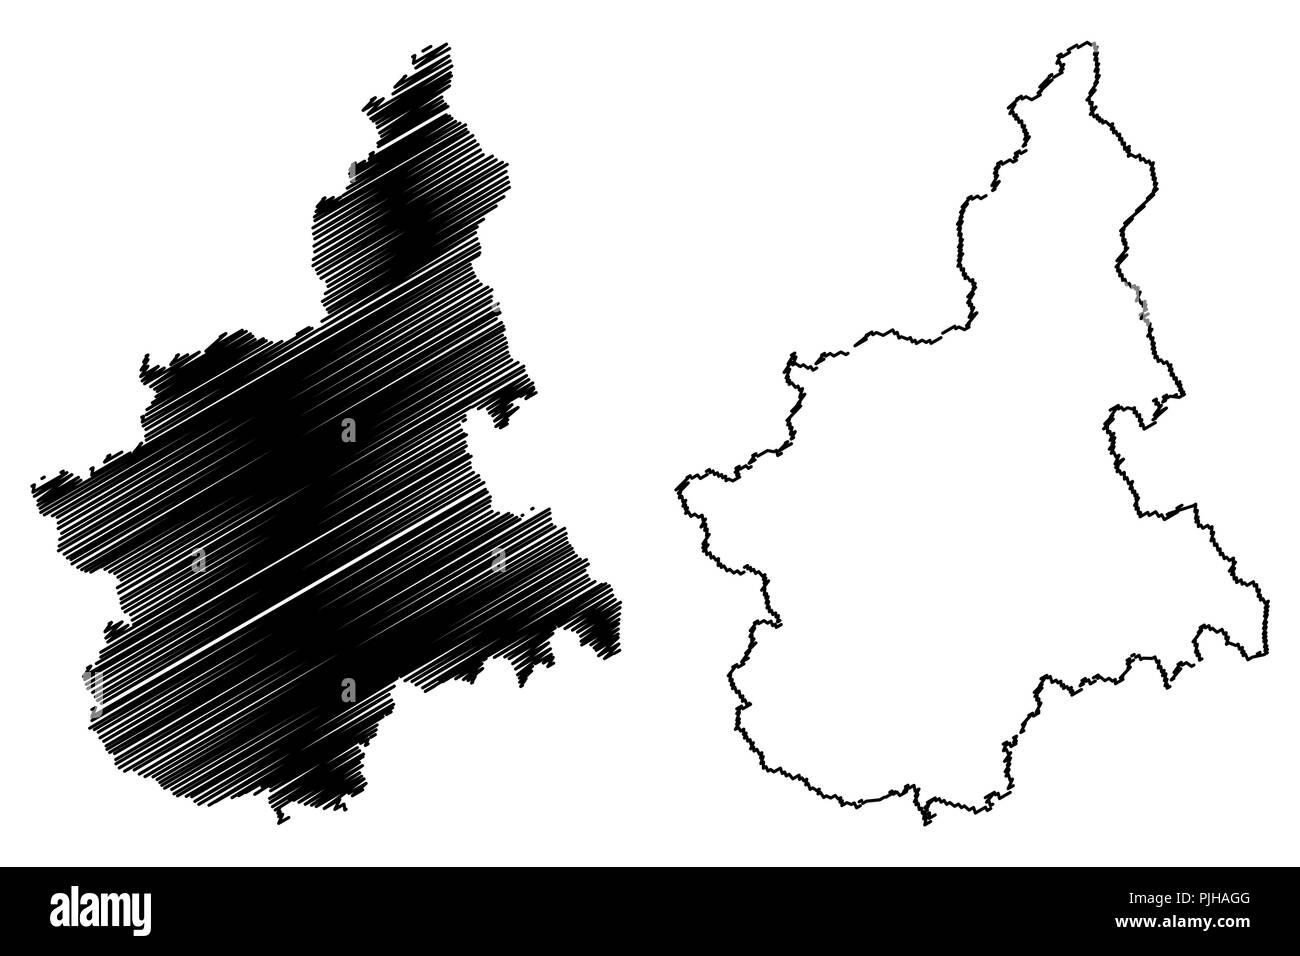 Piedmont Autonomous Region Of Italy Map Vector Illustration